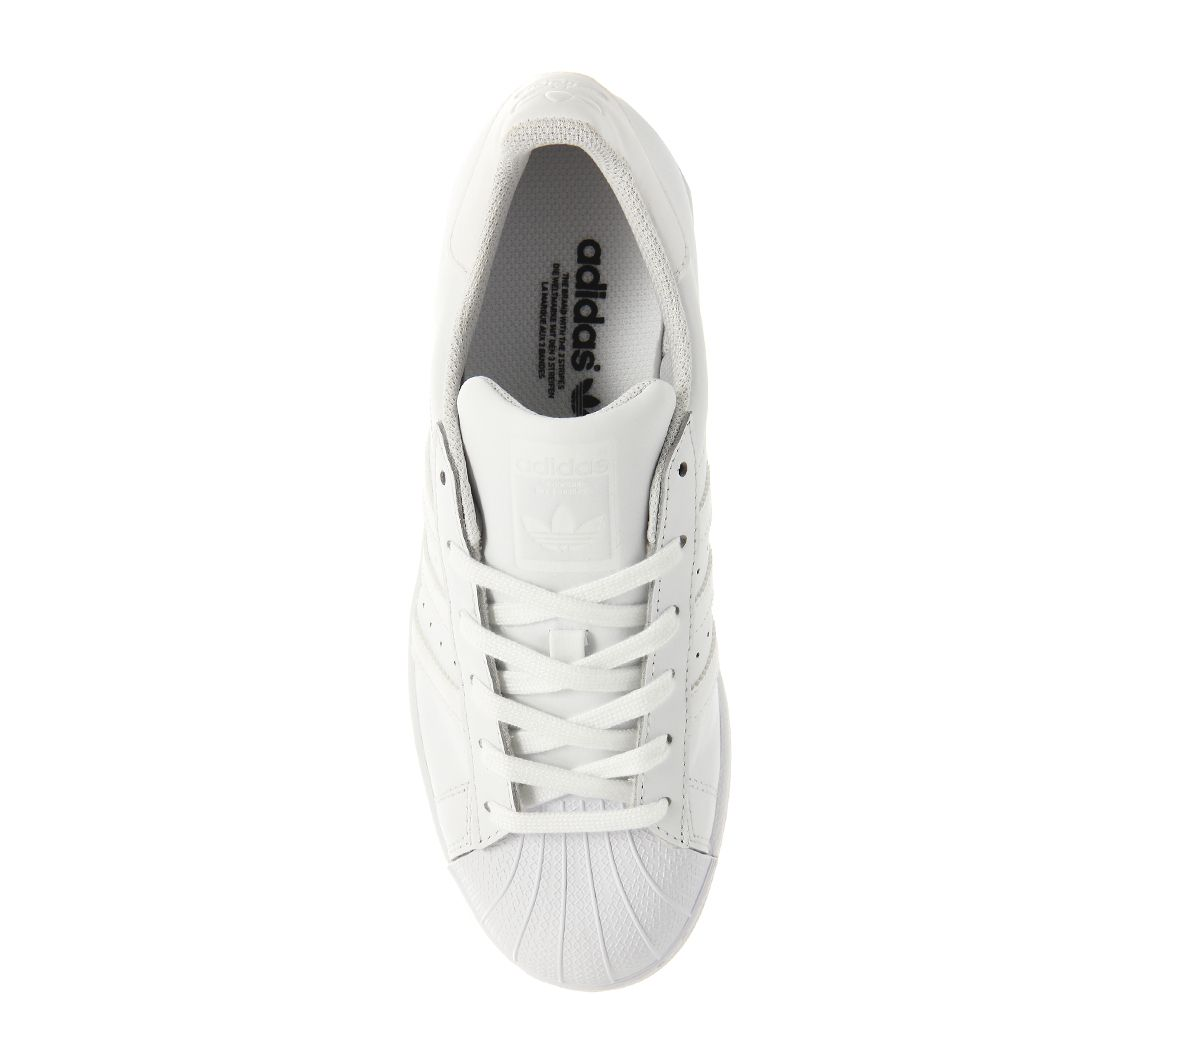 5e54c6000c4 adidas Superstar 1 White Mono Foundation - Unisex Sports